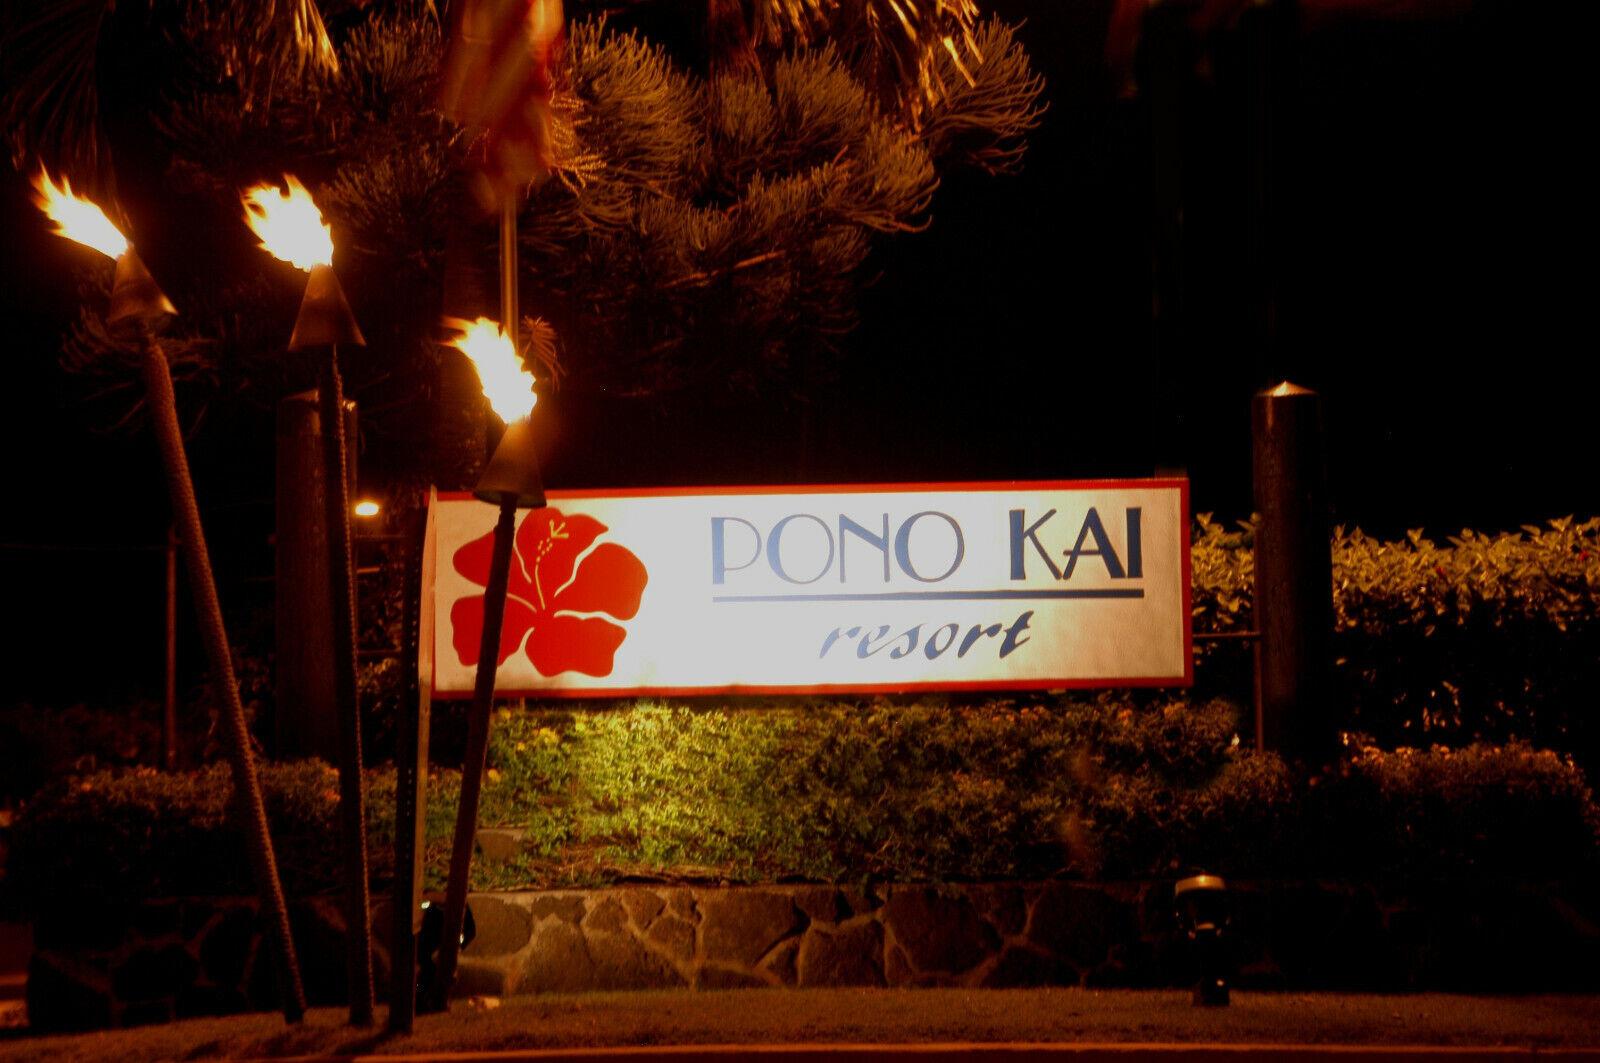 PONO KAI RESORT / BONUS 200 GIFT CARD / HAWAII VACATION DEEDED TIMESHARE  - $1.00